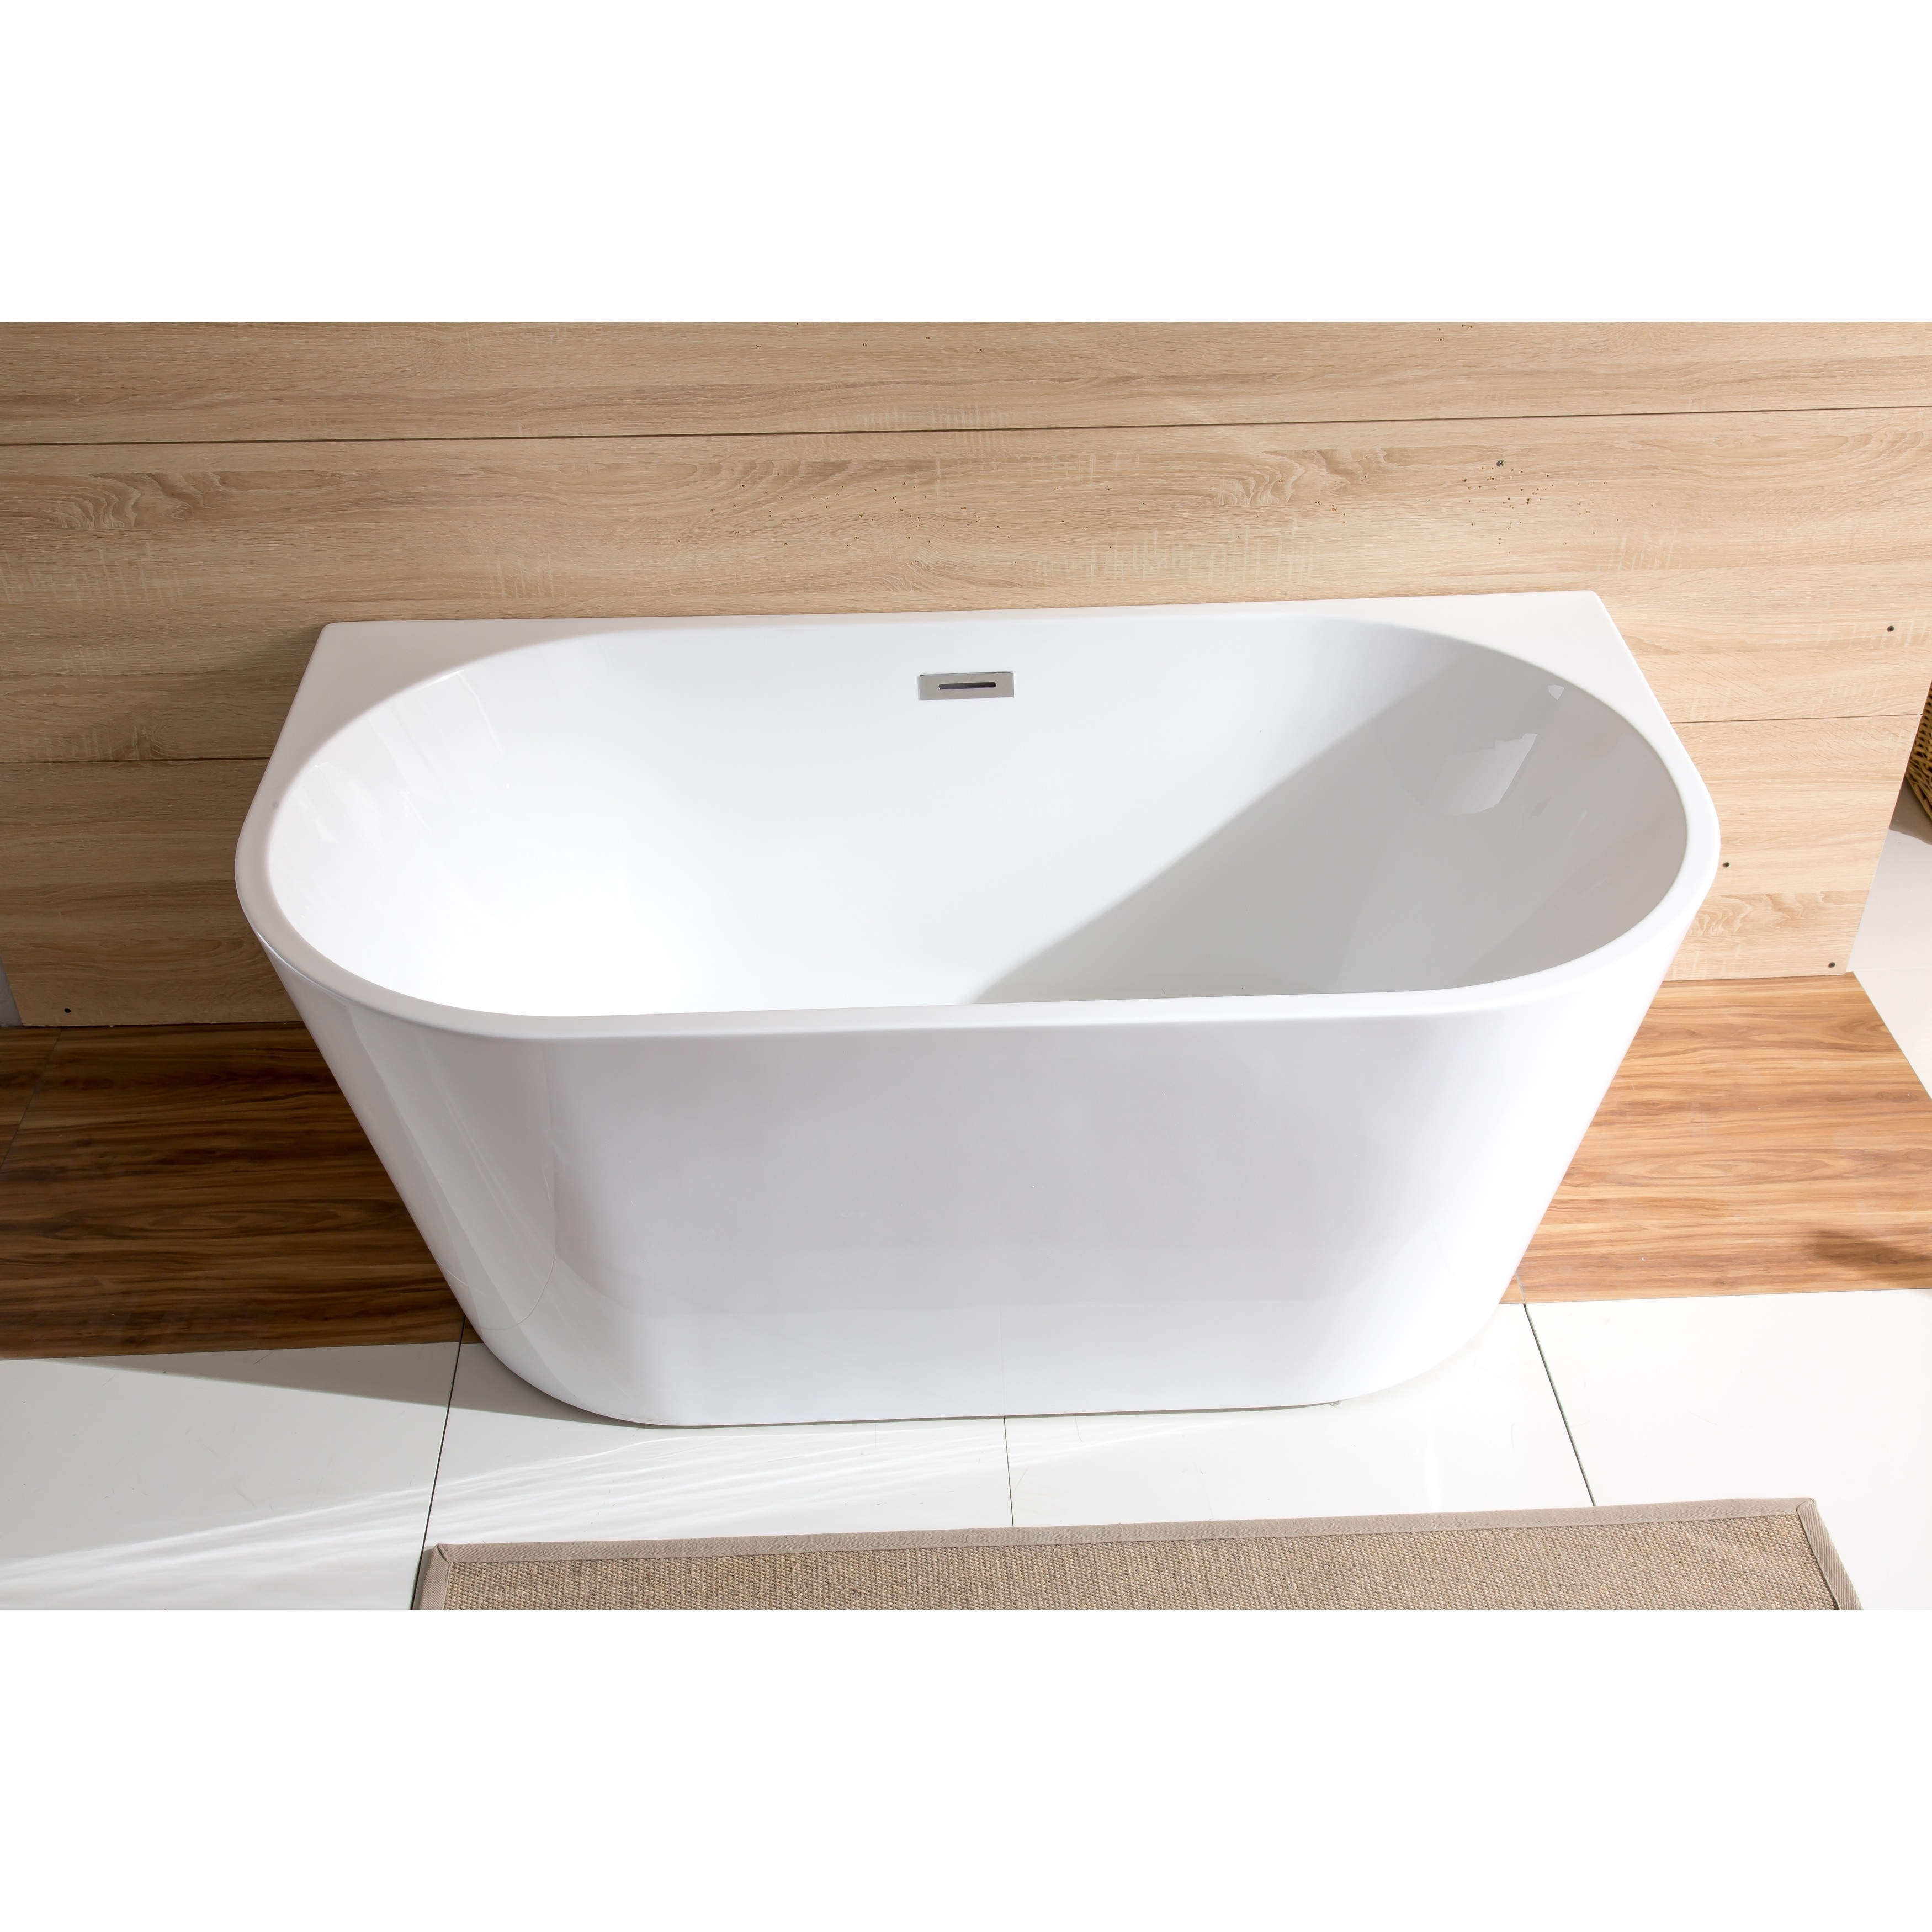 59 Streamline M 2420 59Fswh Fm Soaking Freestanding Tub With Internal Drain